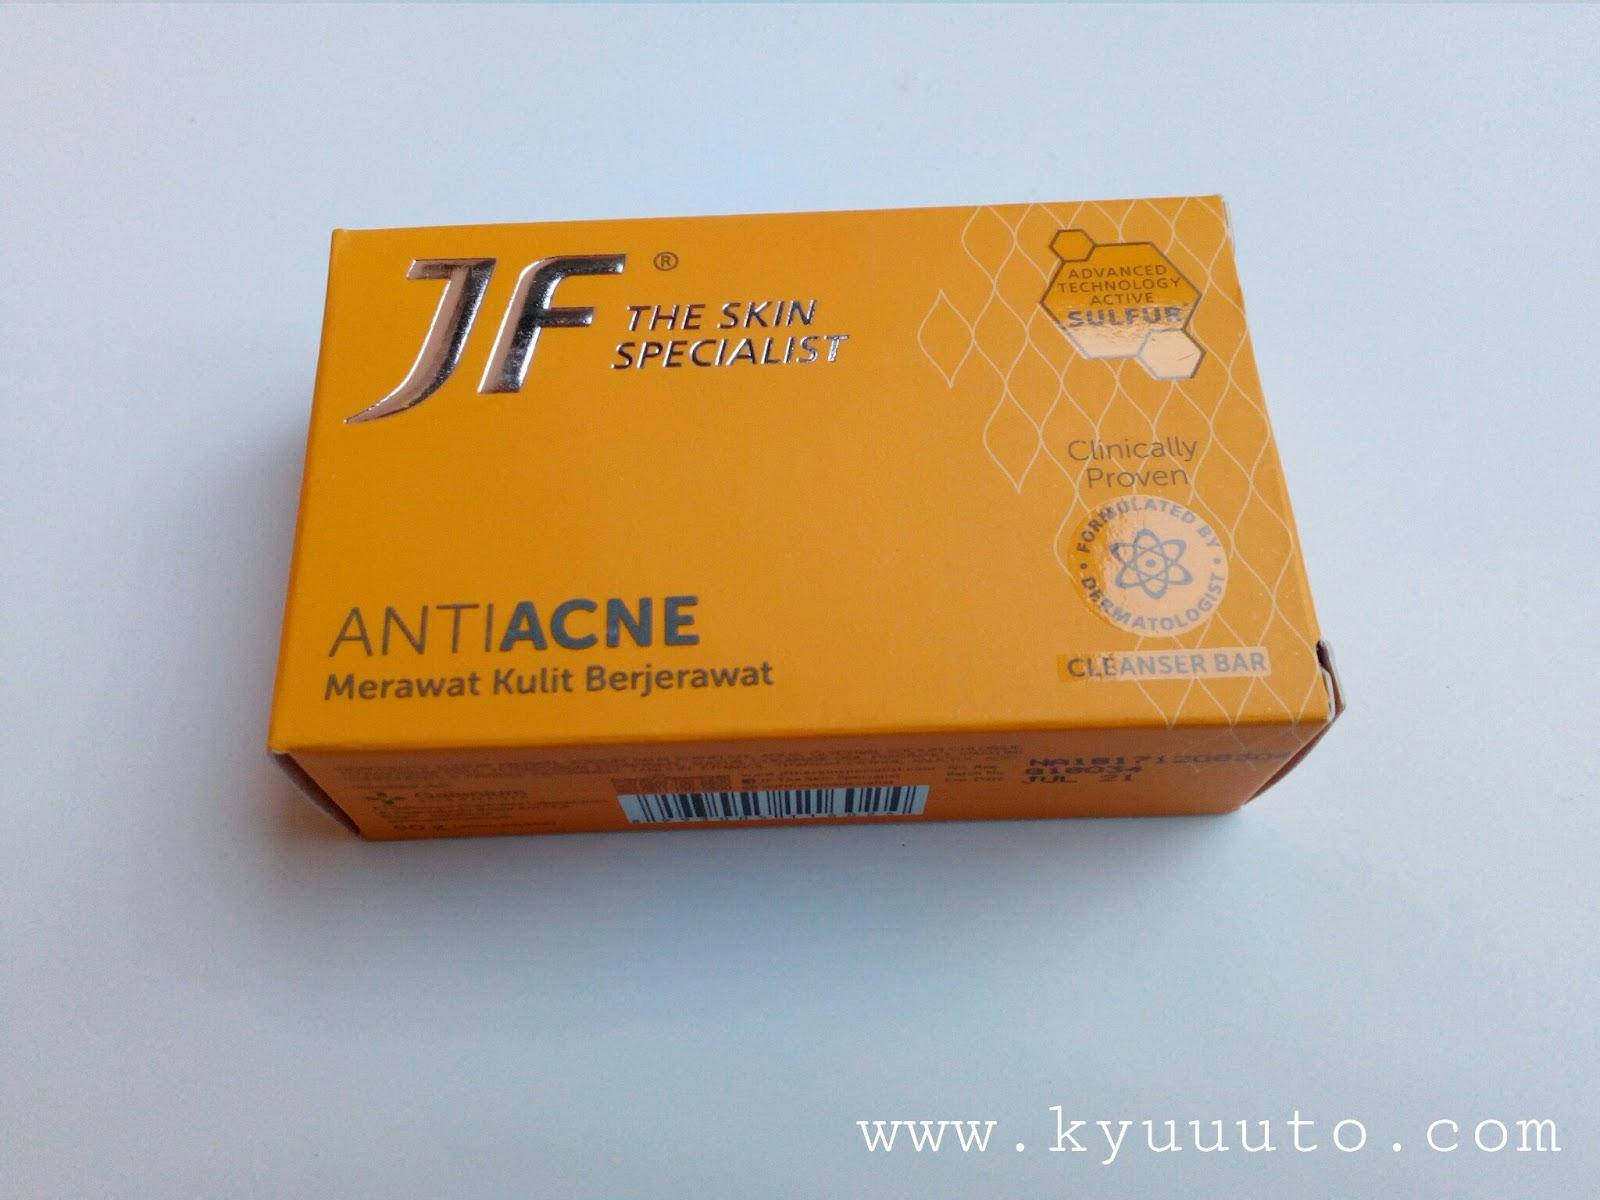 Manfaat Sabun Jf Sulfur Warna Orange